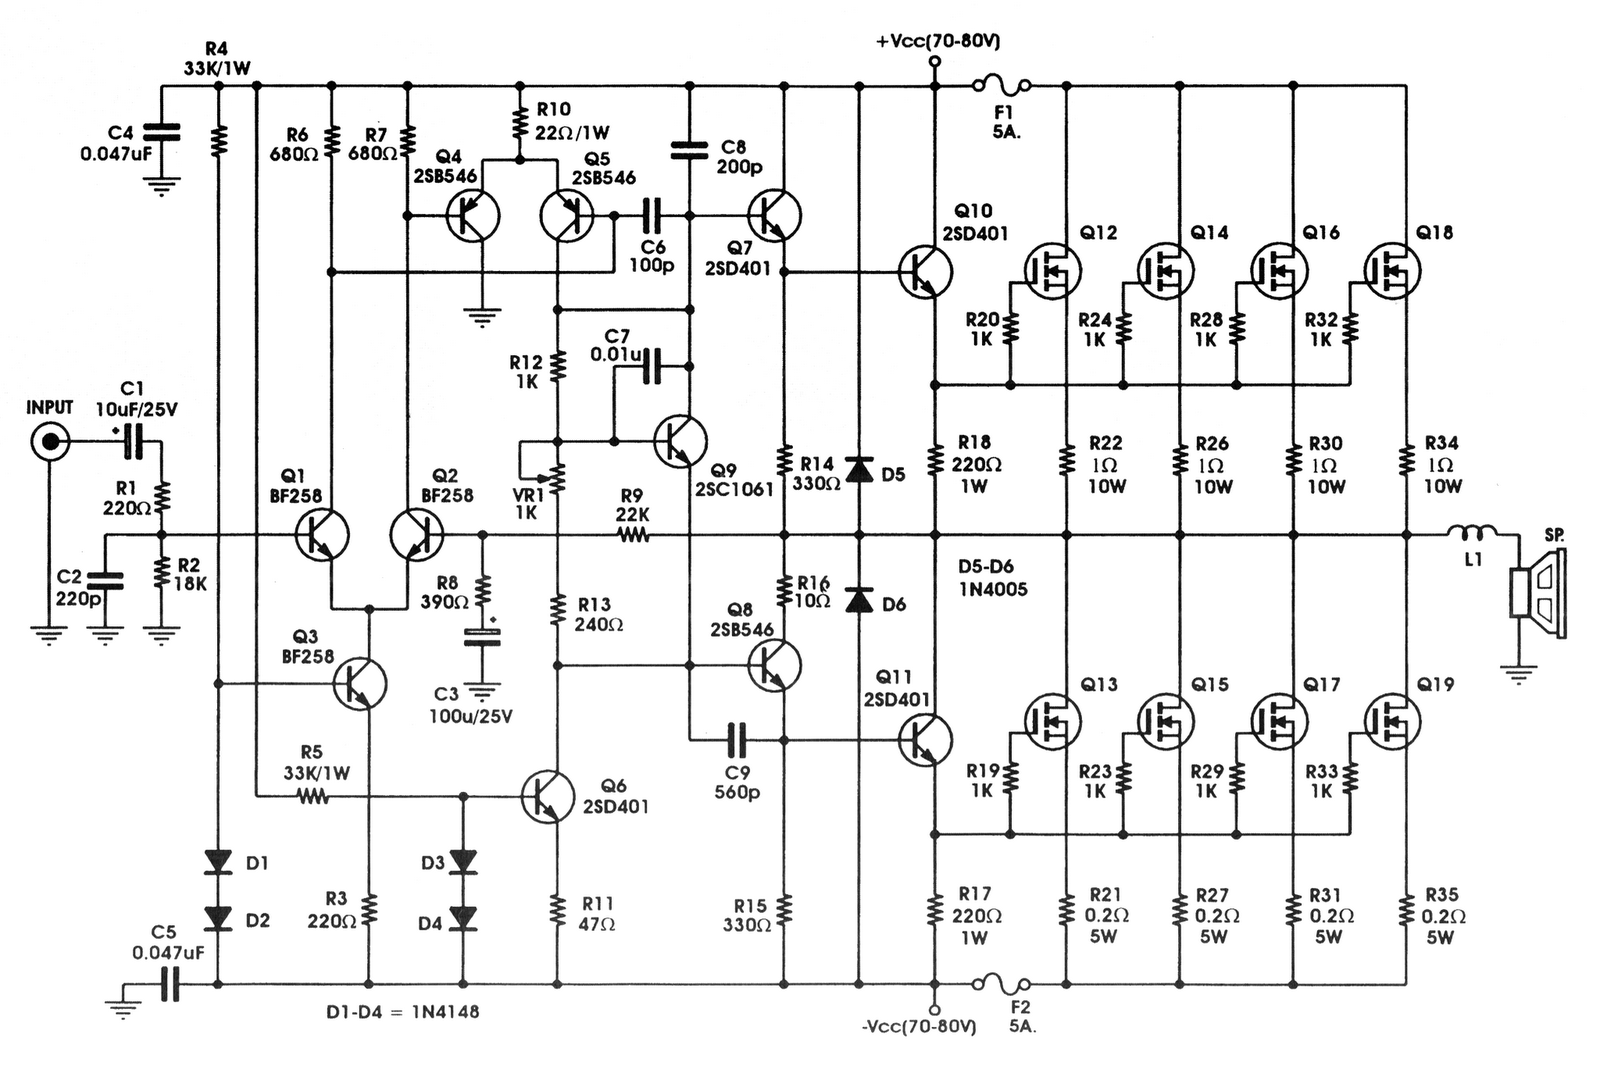 2500w Power Mosfet Amplifier Circuit - Vga Splitter Wiring Diagram -  5pin.honda-accordd.waystar.fr